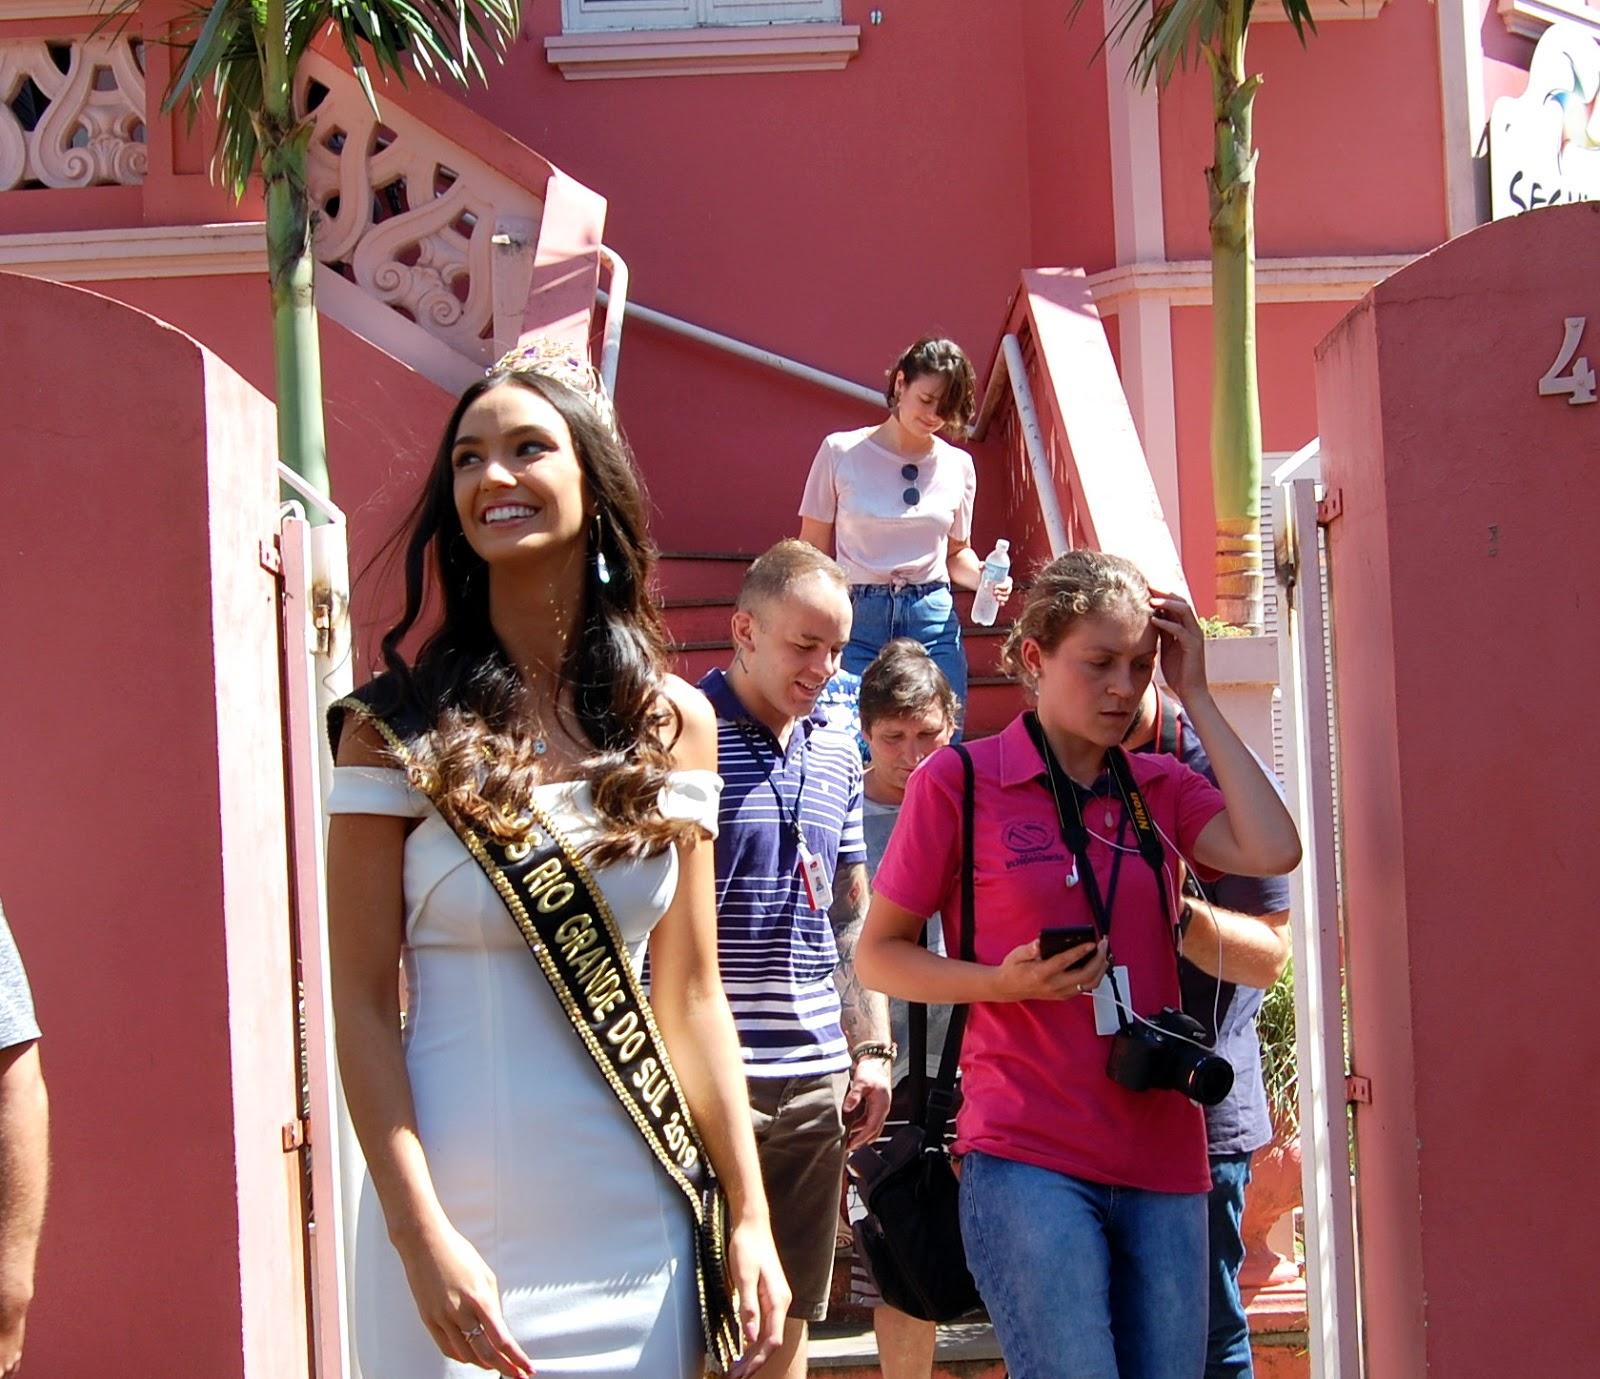 bianca scheren, top 5 de miss brasil universo 2019. - Página 5 Dsc_0023